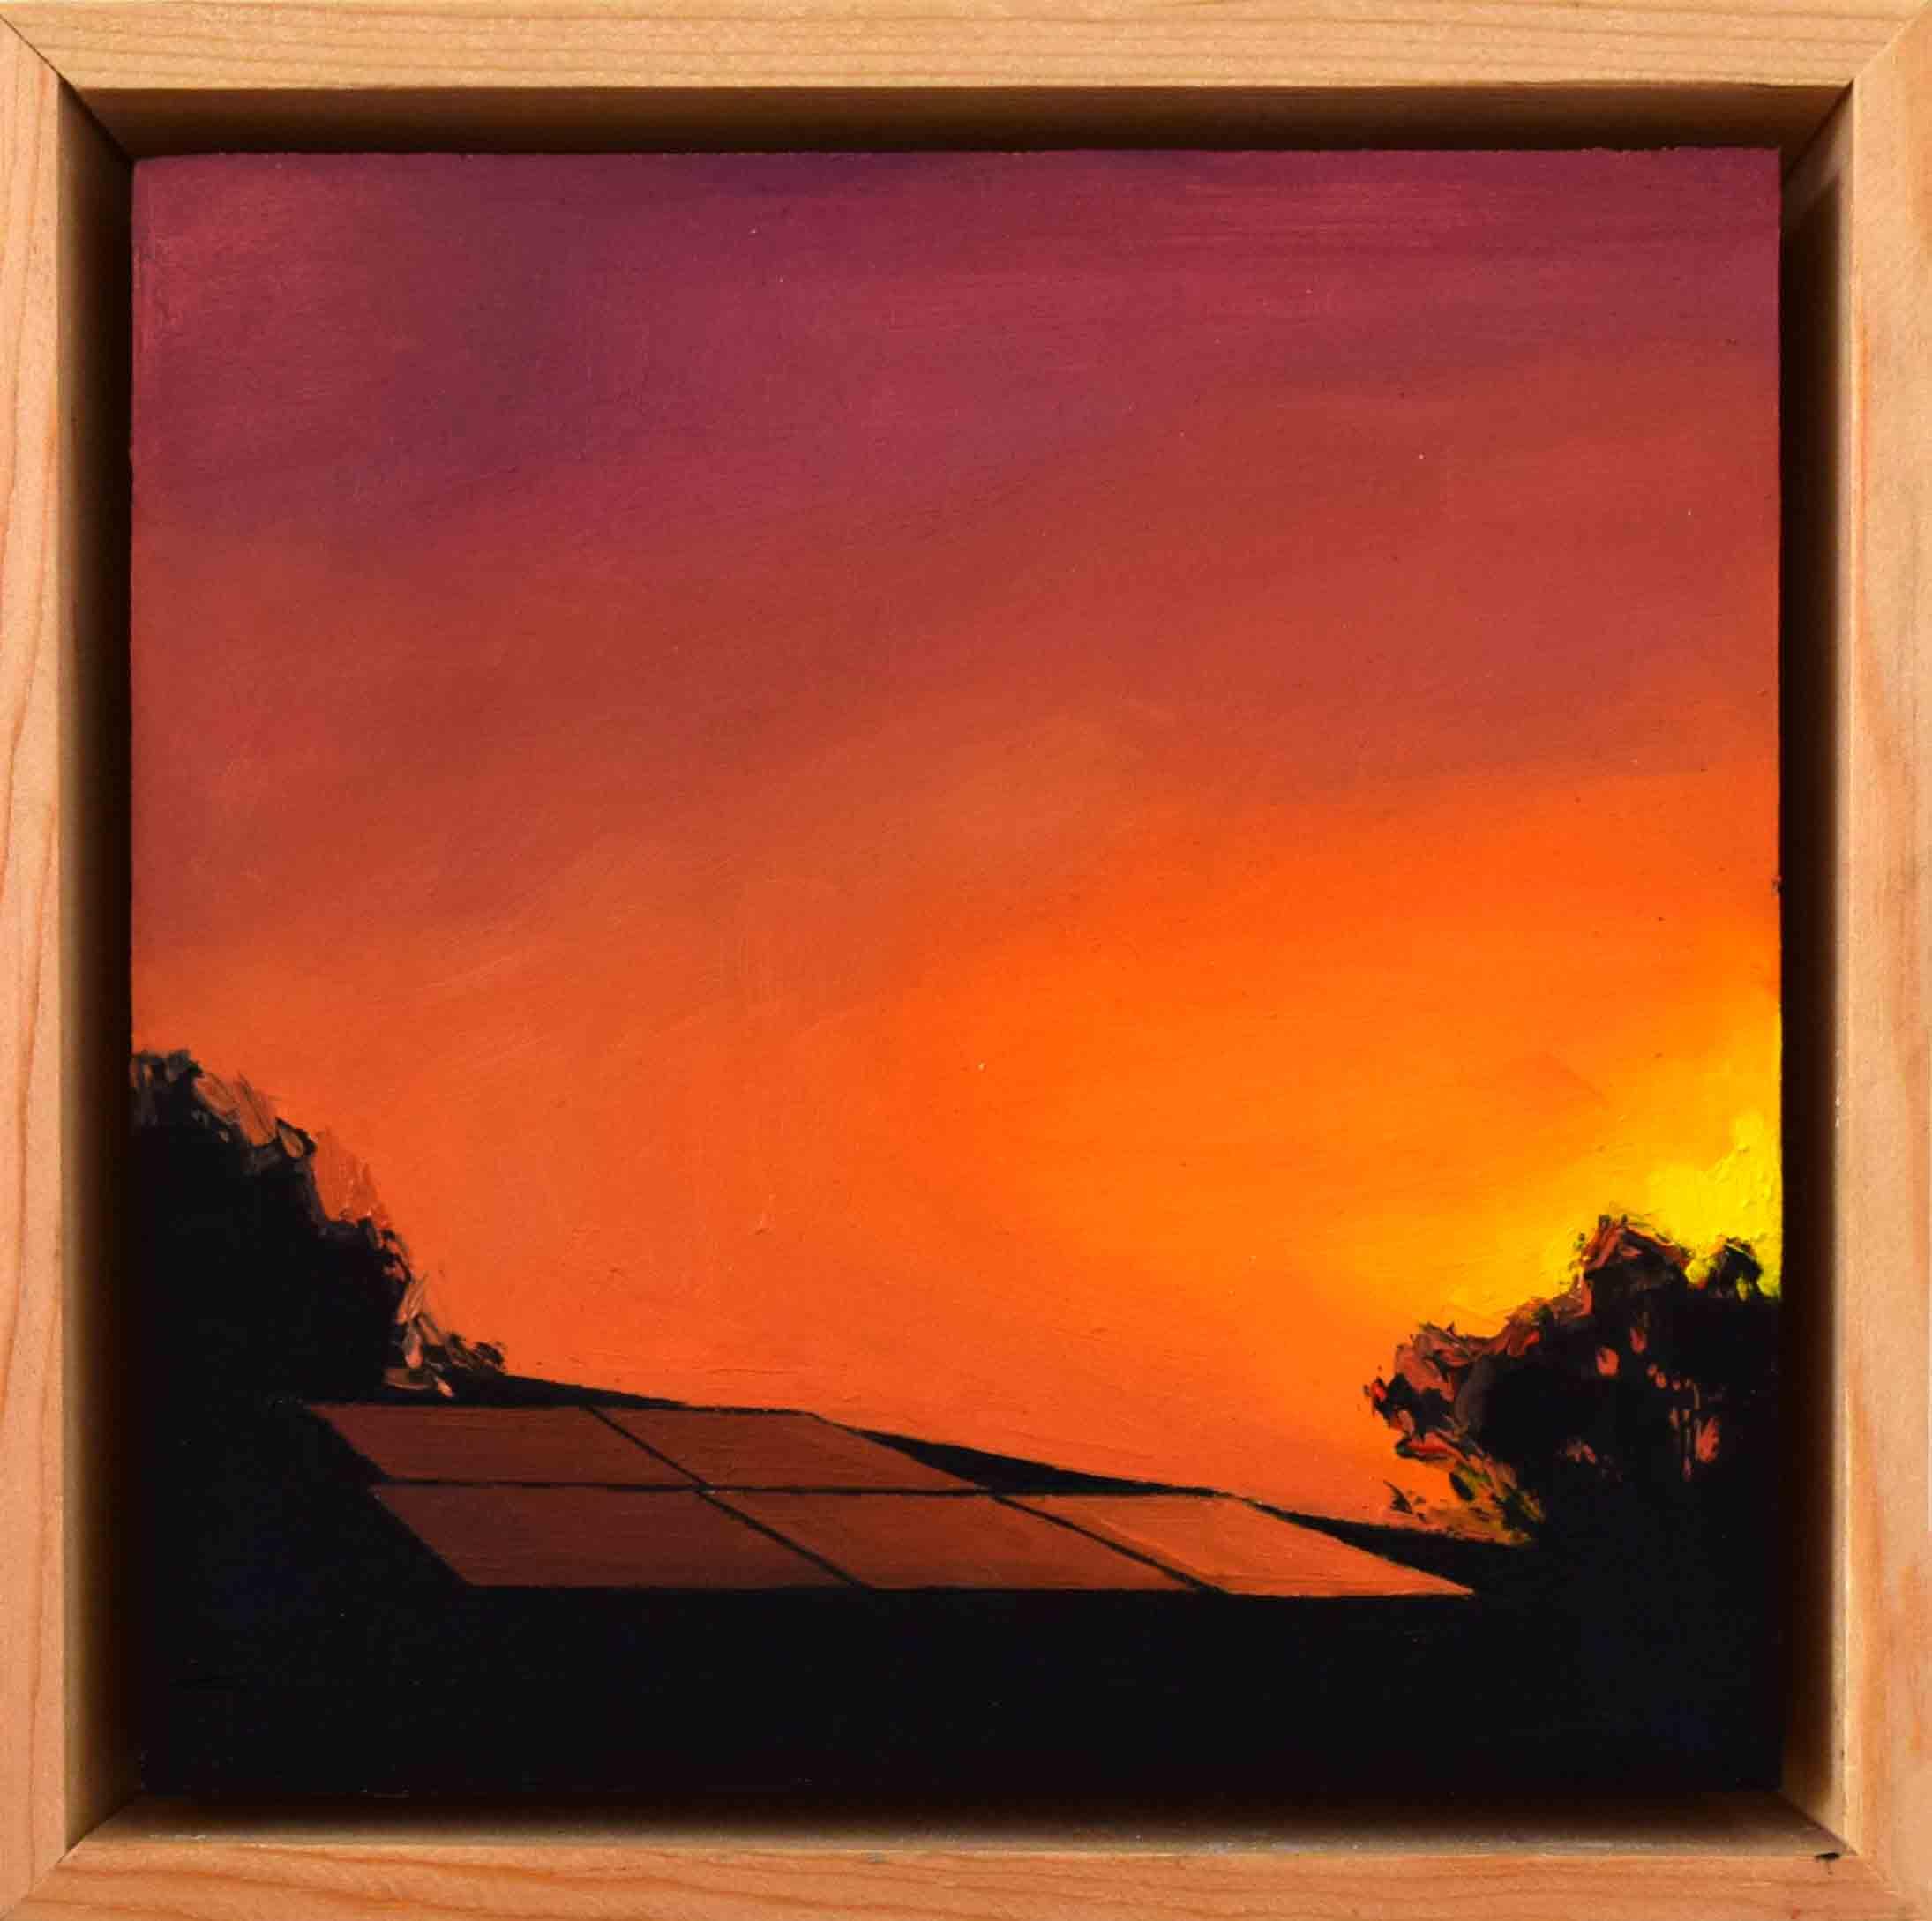 8. Ellen Norrish,  @kalinkosturkov #sunpower #sunset , 2019, oil on board, 15 x 15 cm $260